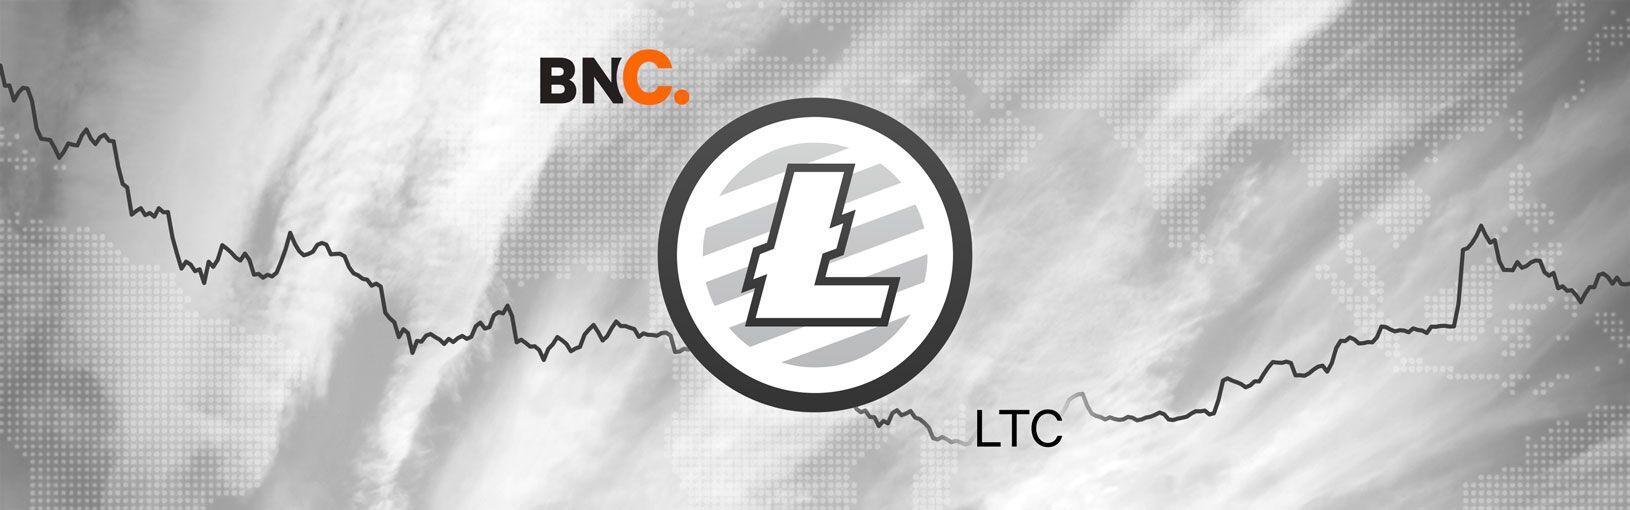 Litecoin Price Analysis - Block reward halving on the horizon